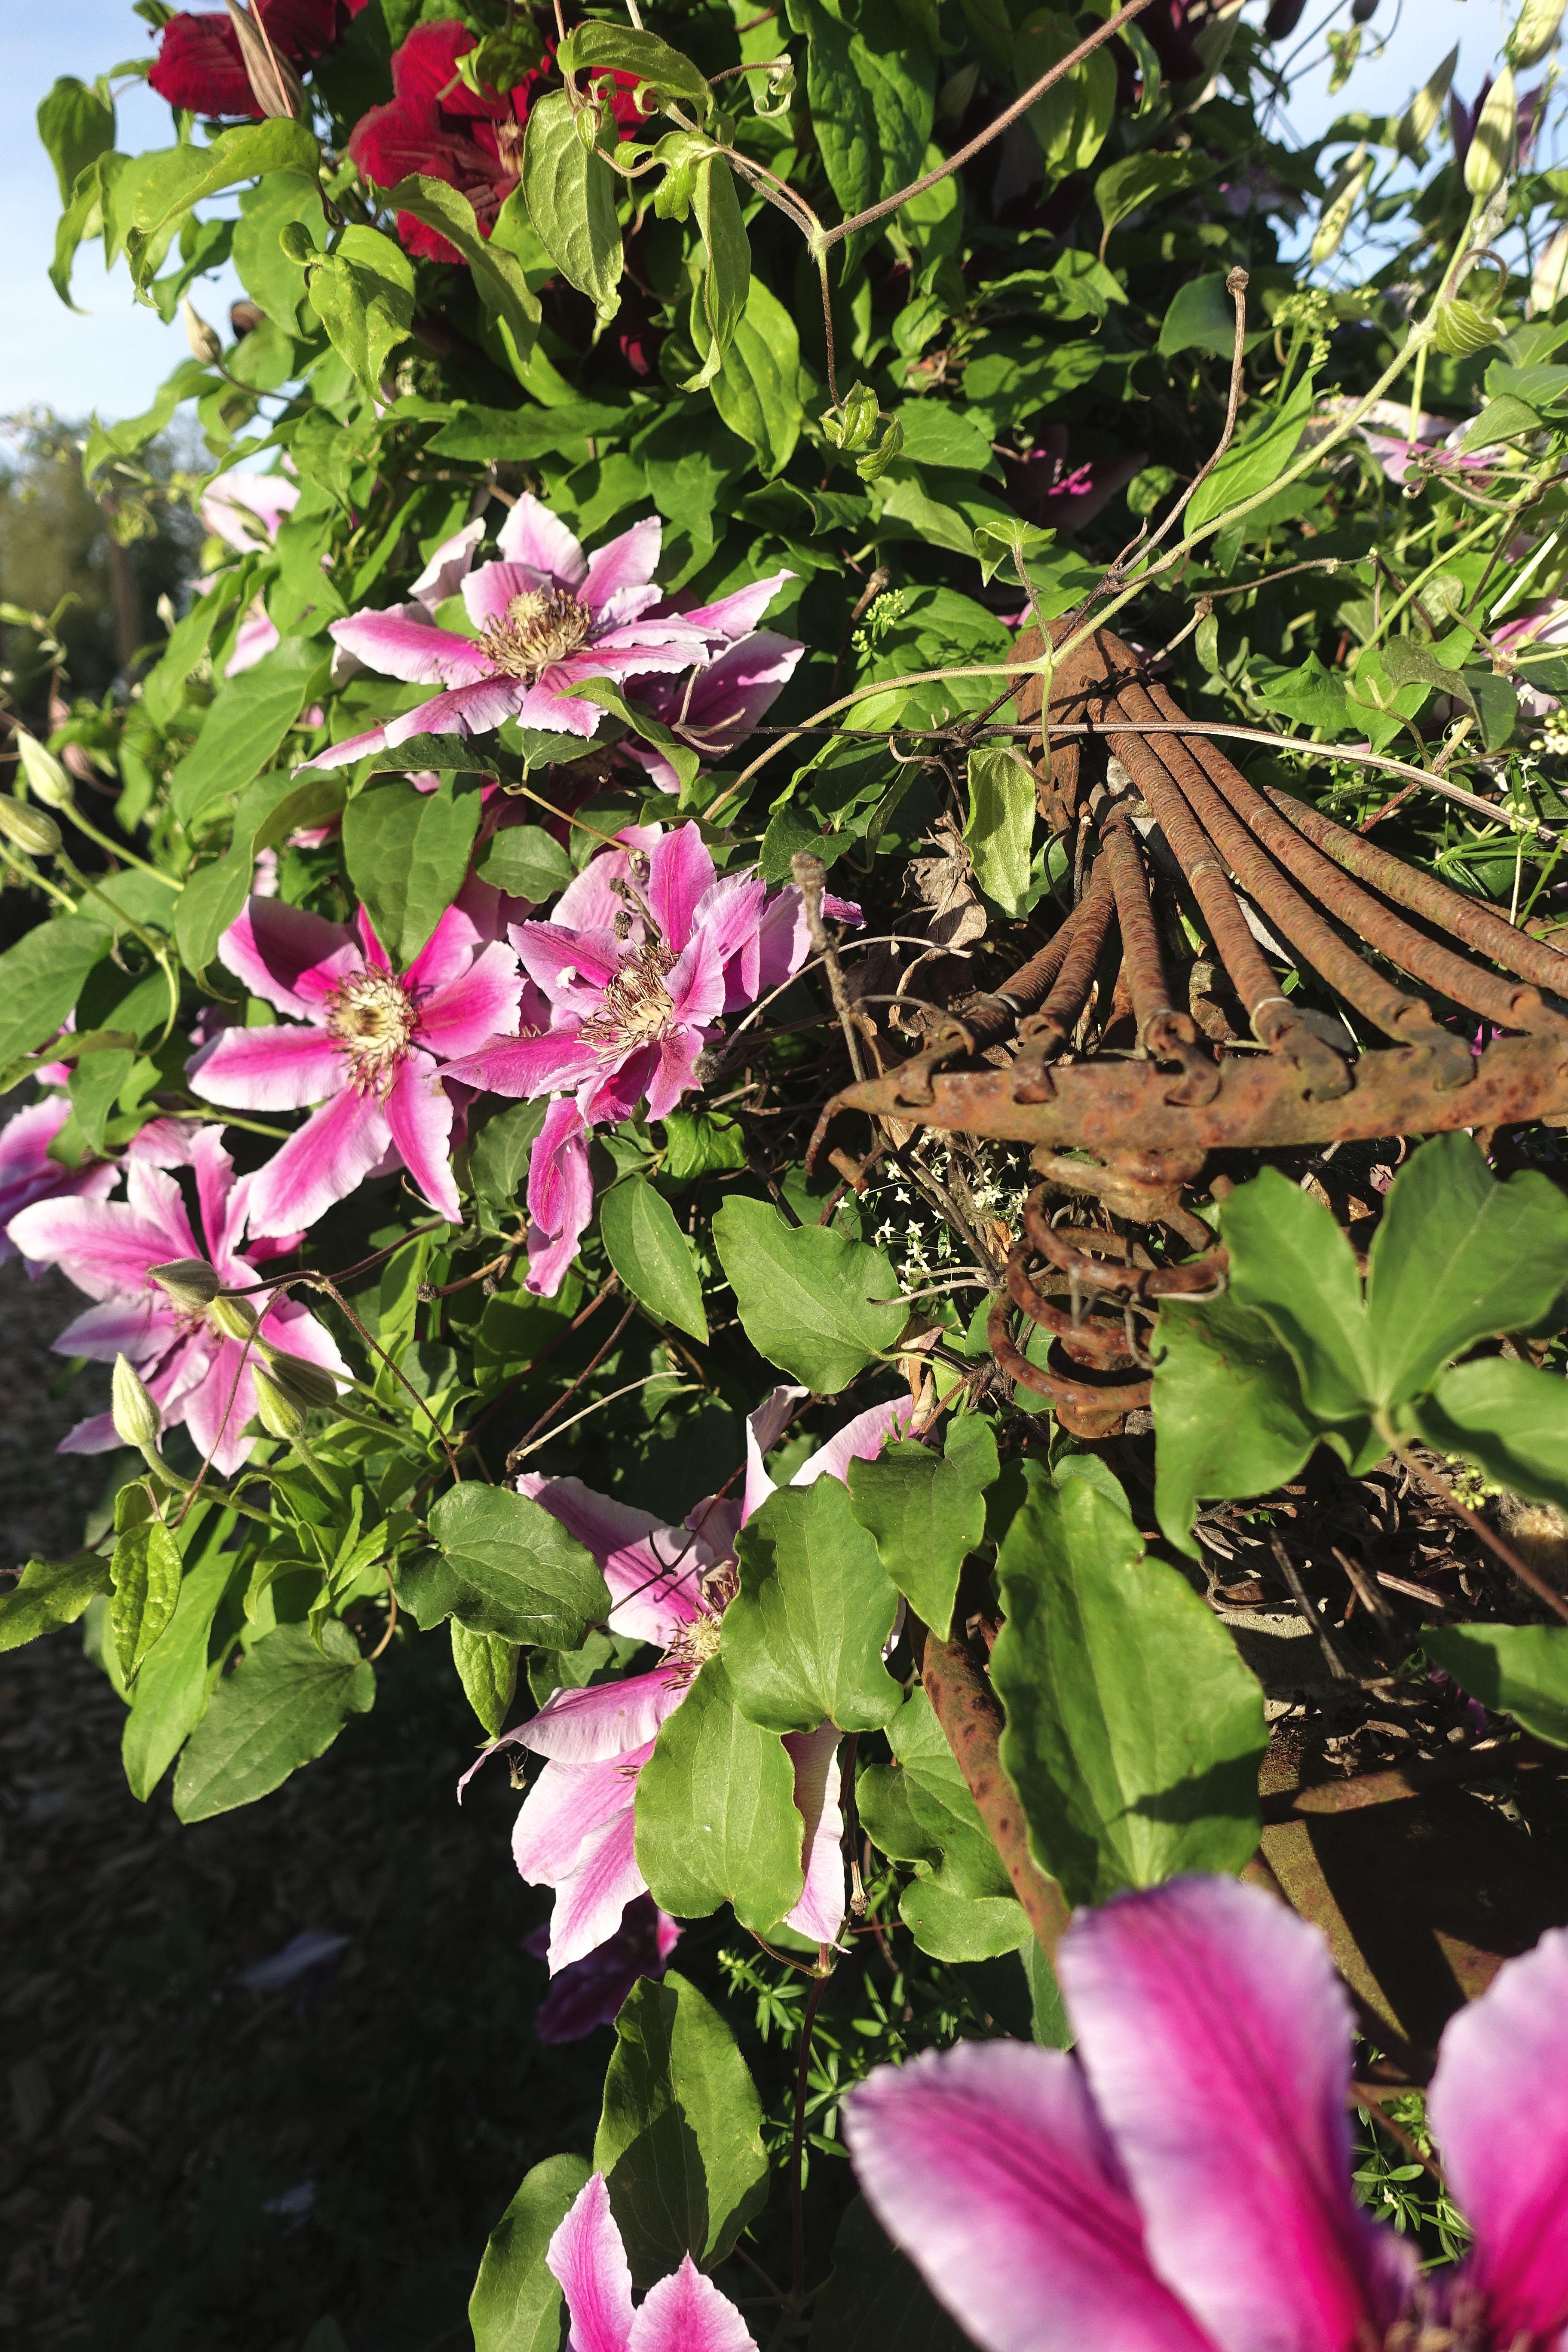 Rosa blommor bland grönt bladverk. Pink clematis flowers.